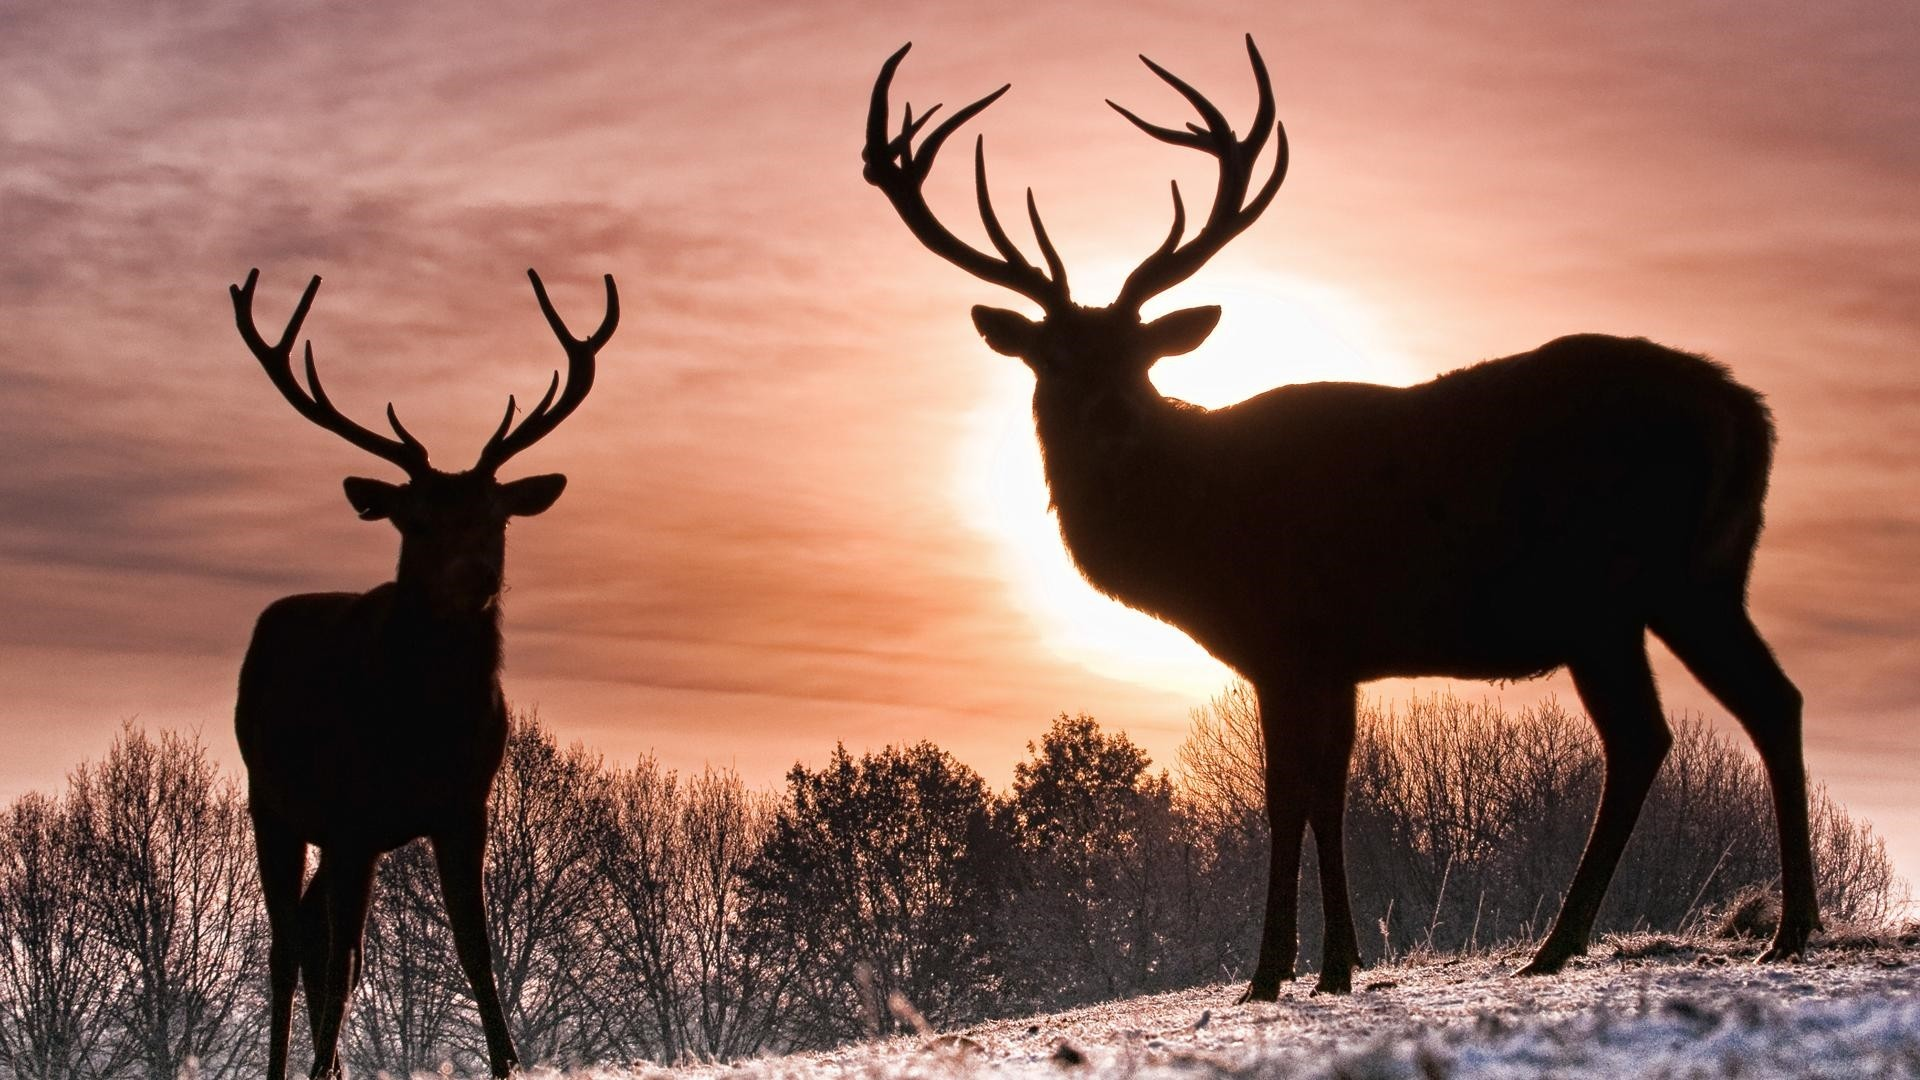 Deer a wallpaper